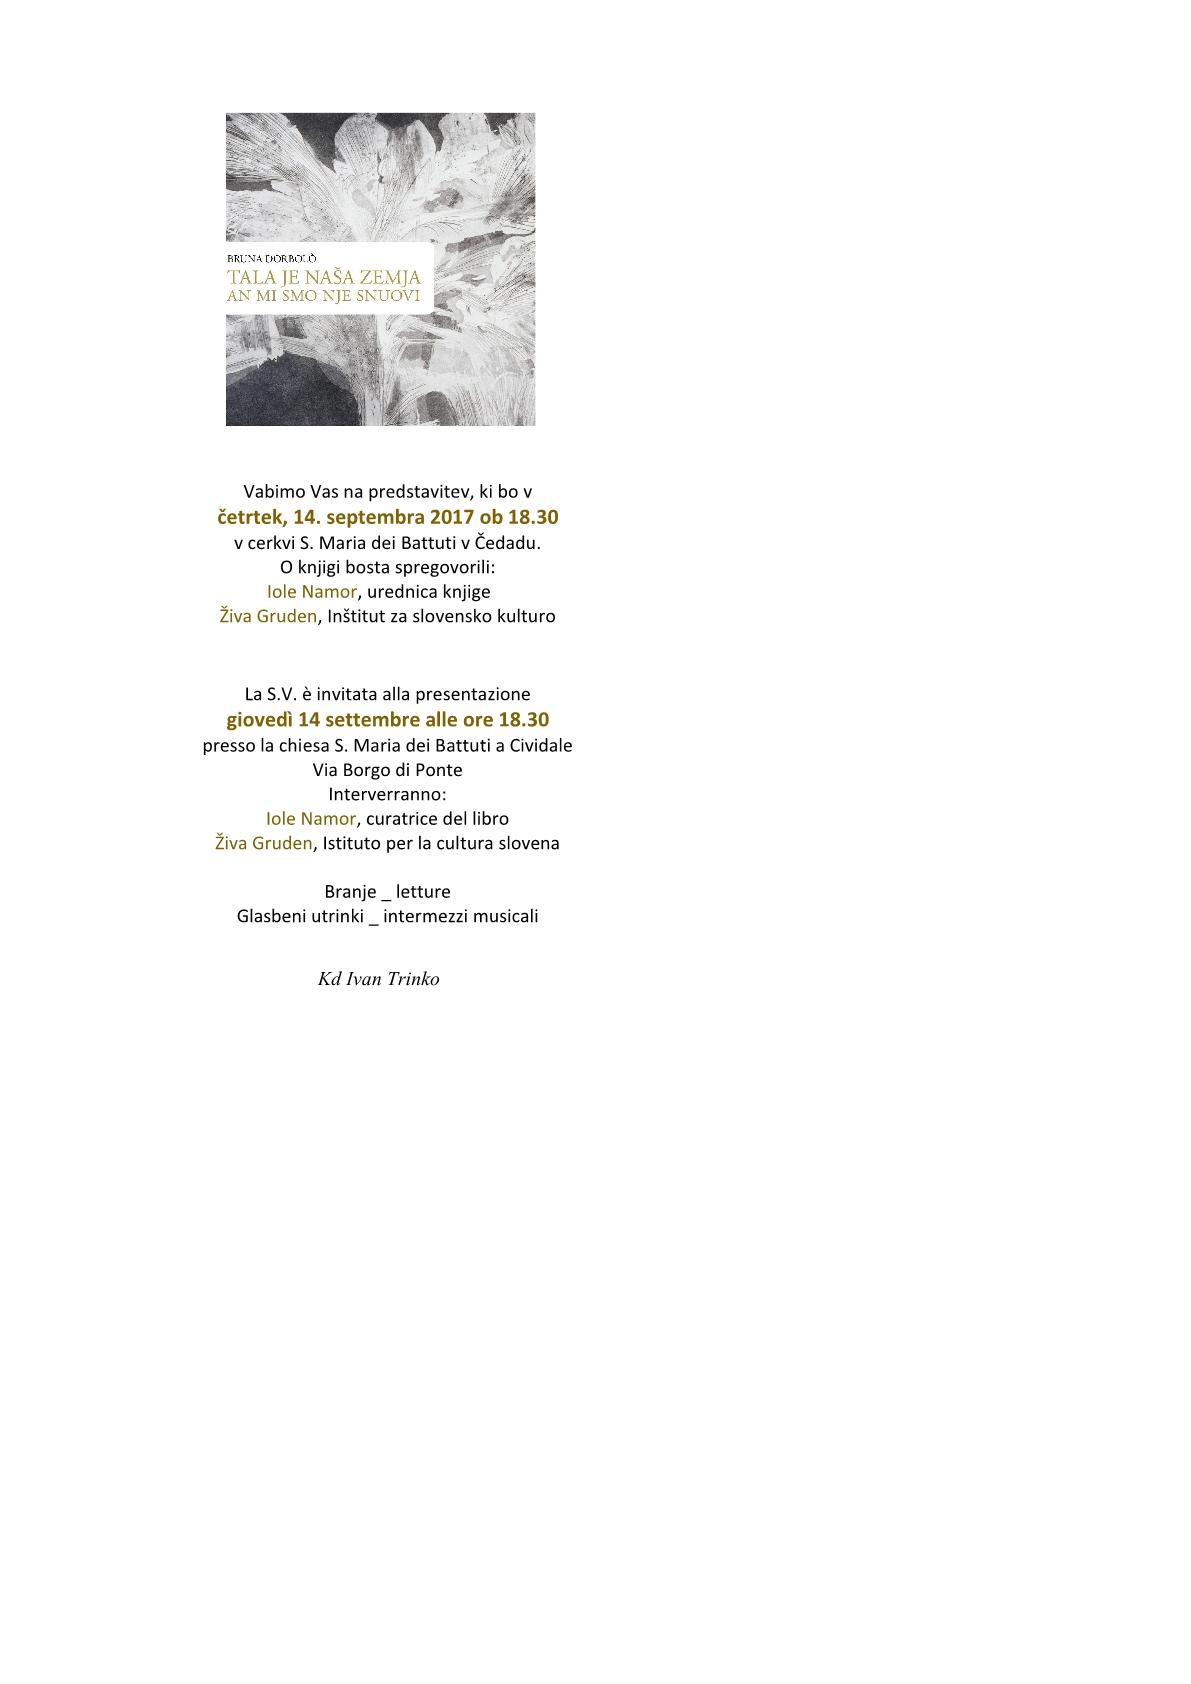 vabilo- invito knjiga Bruna1